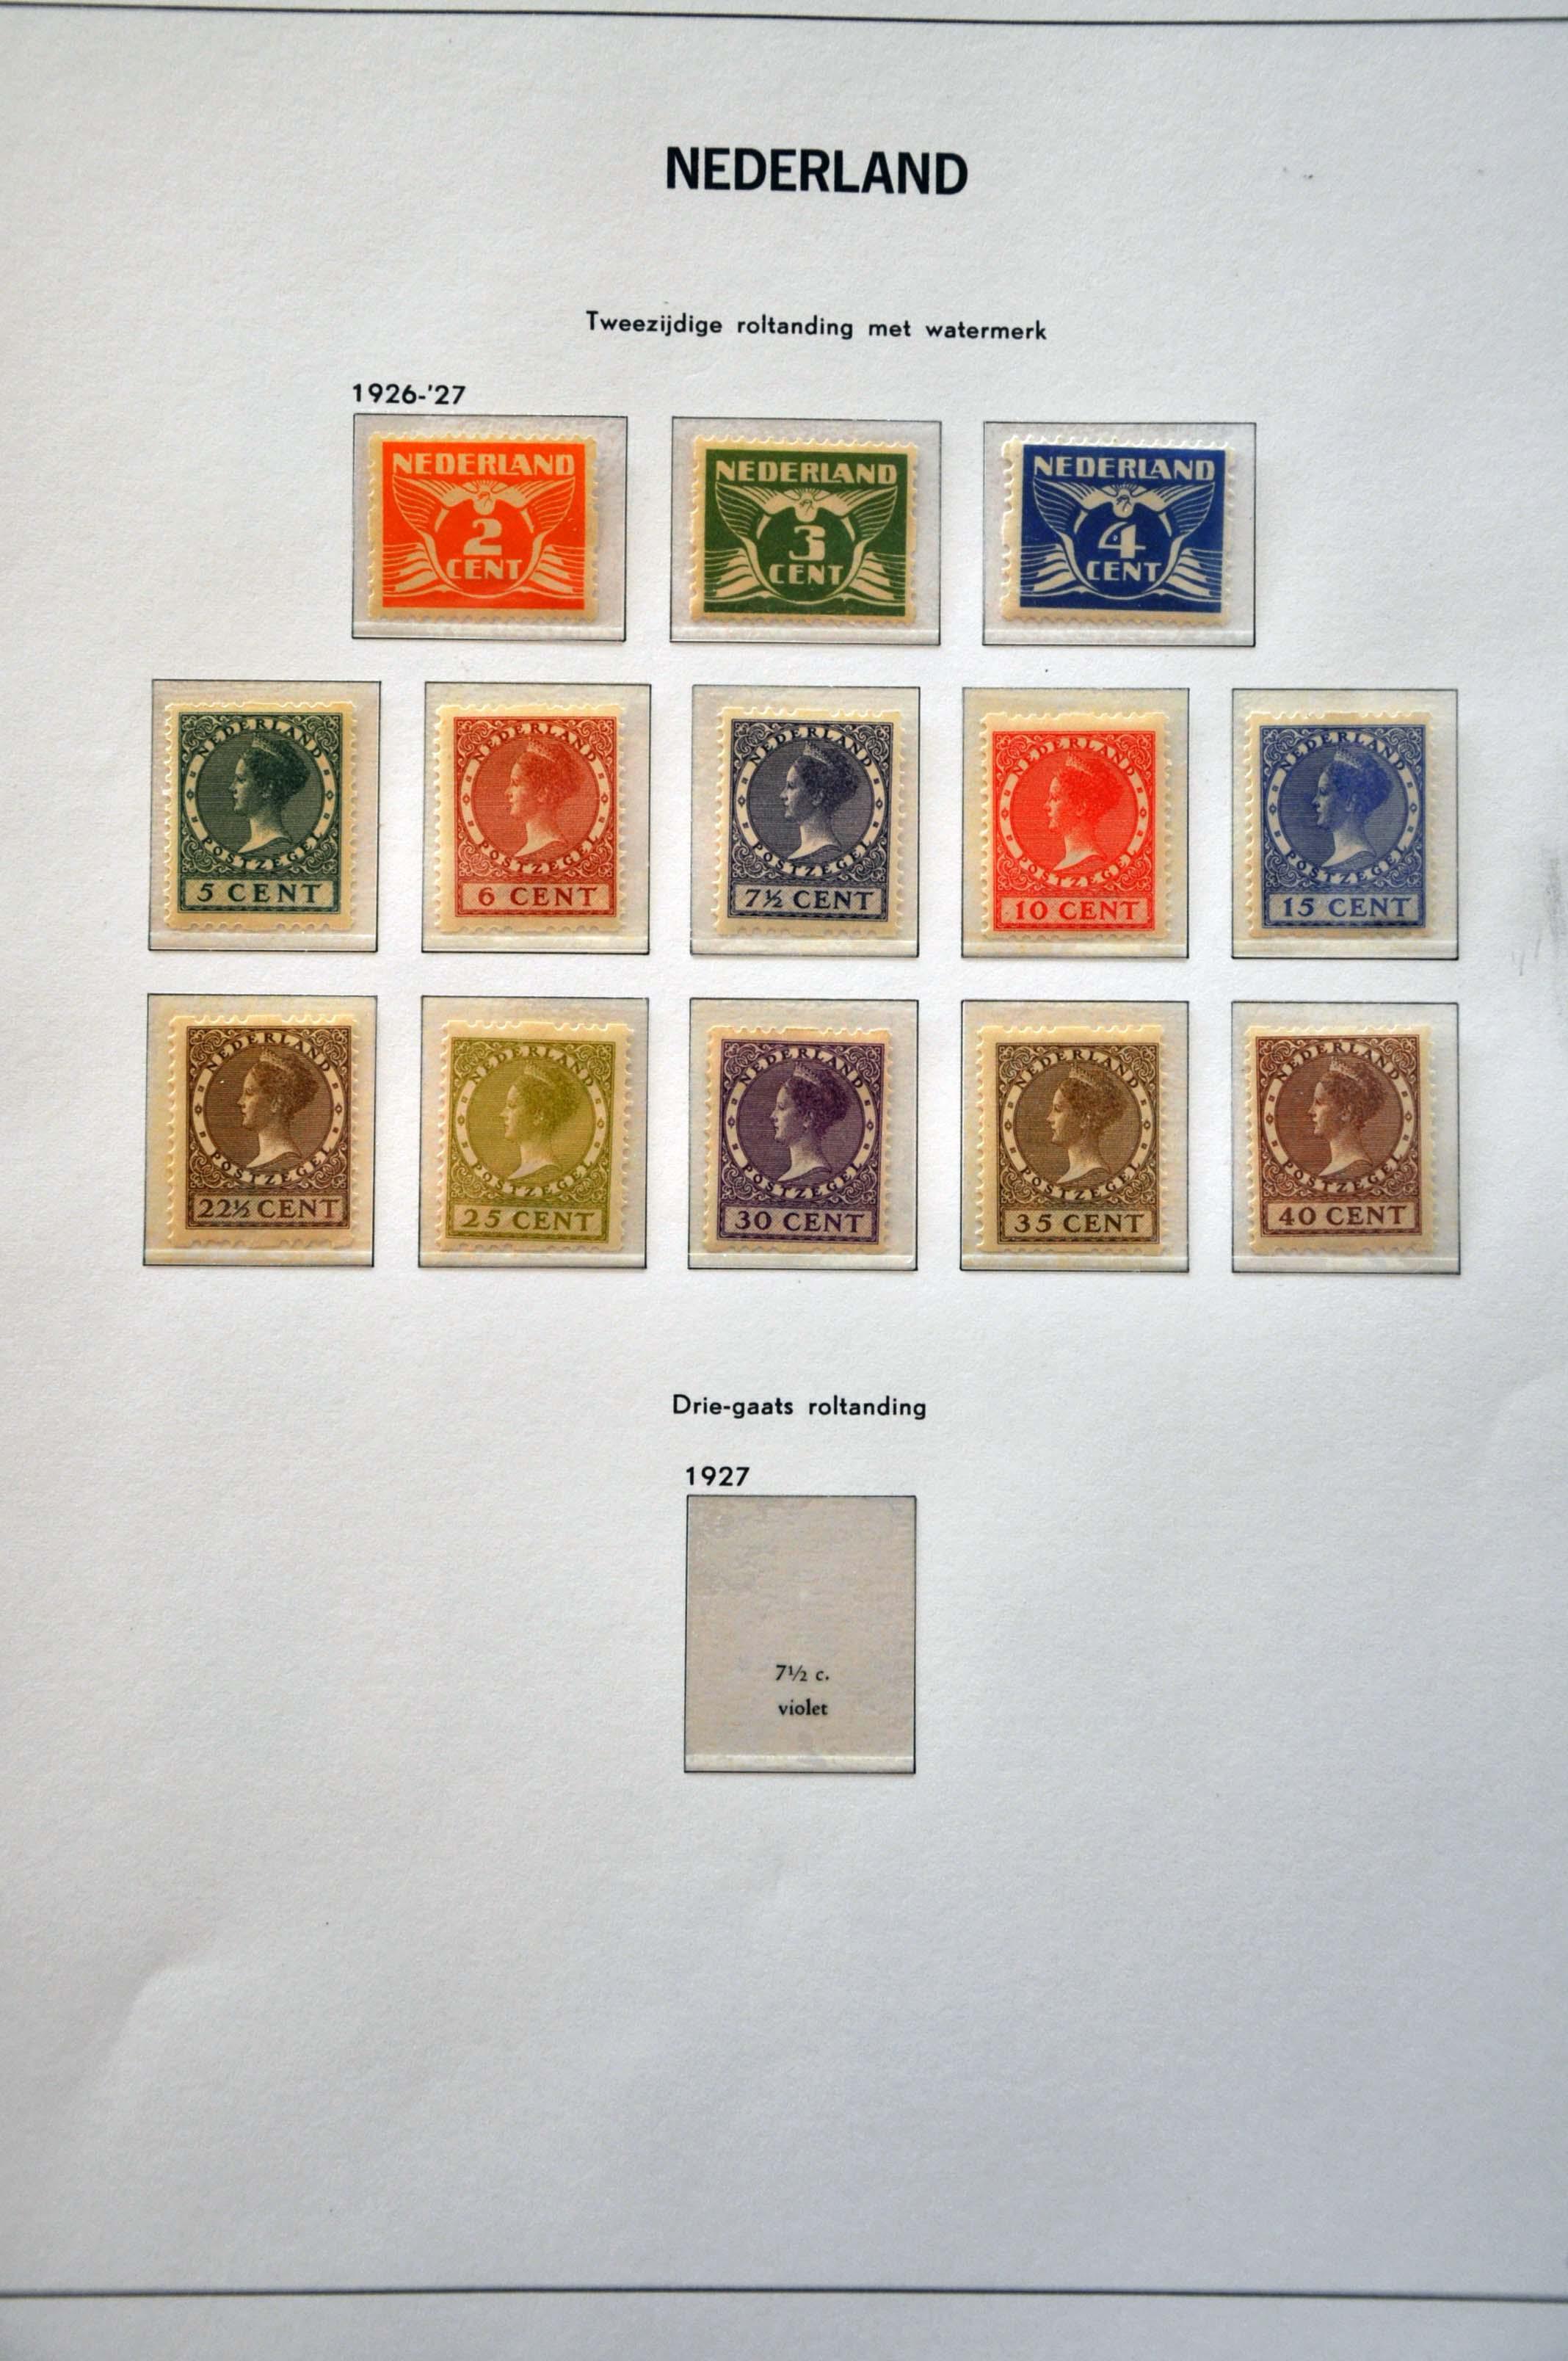 Lot 1710 - Netherlands and former colonies Netherlands -  Corinphila Veilingen Auction 242: General sale